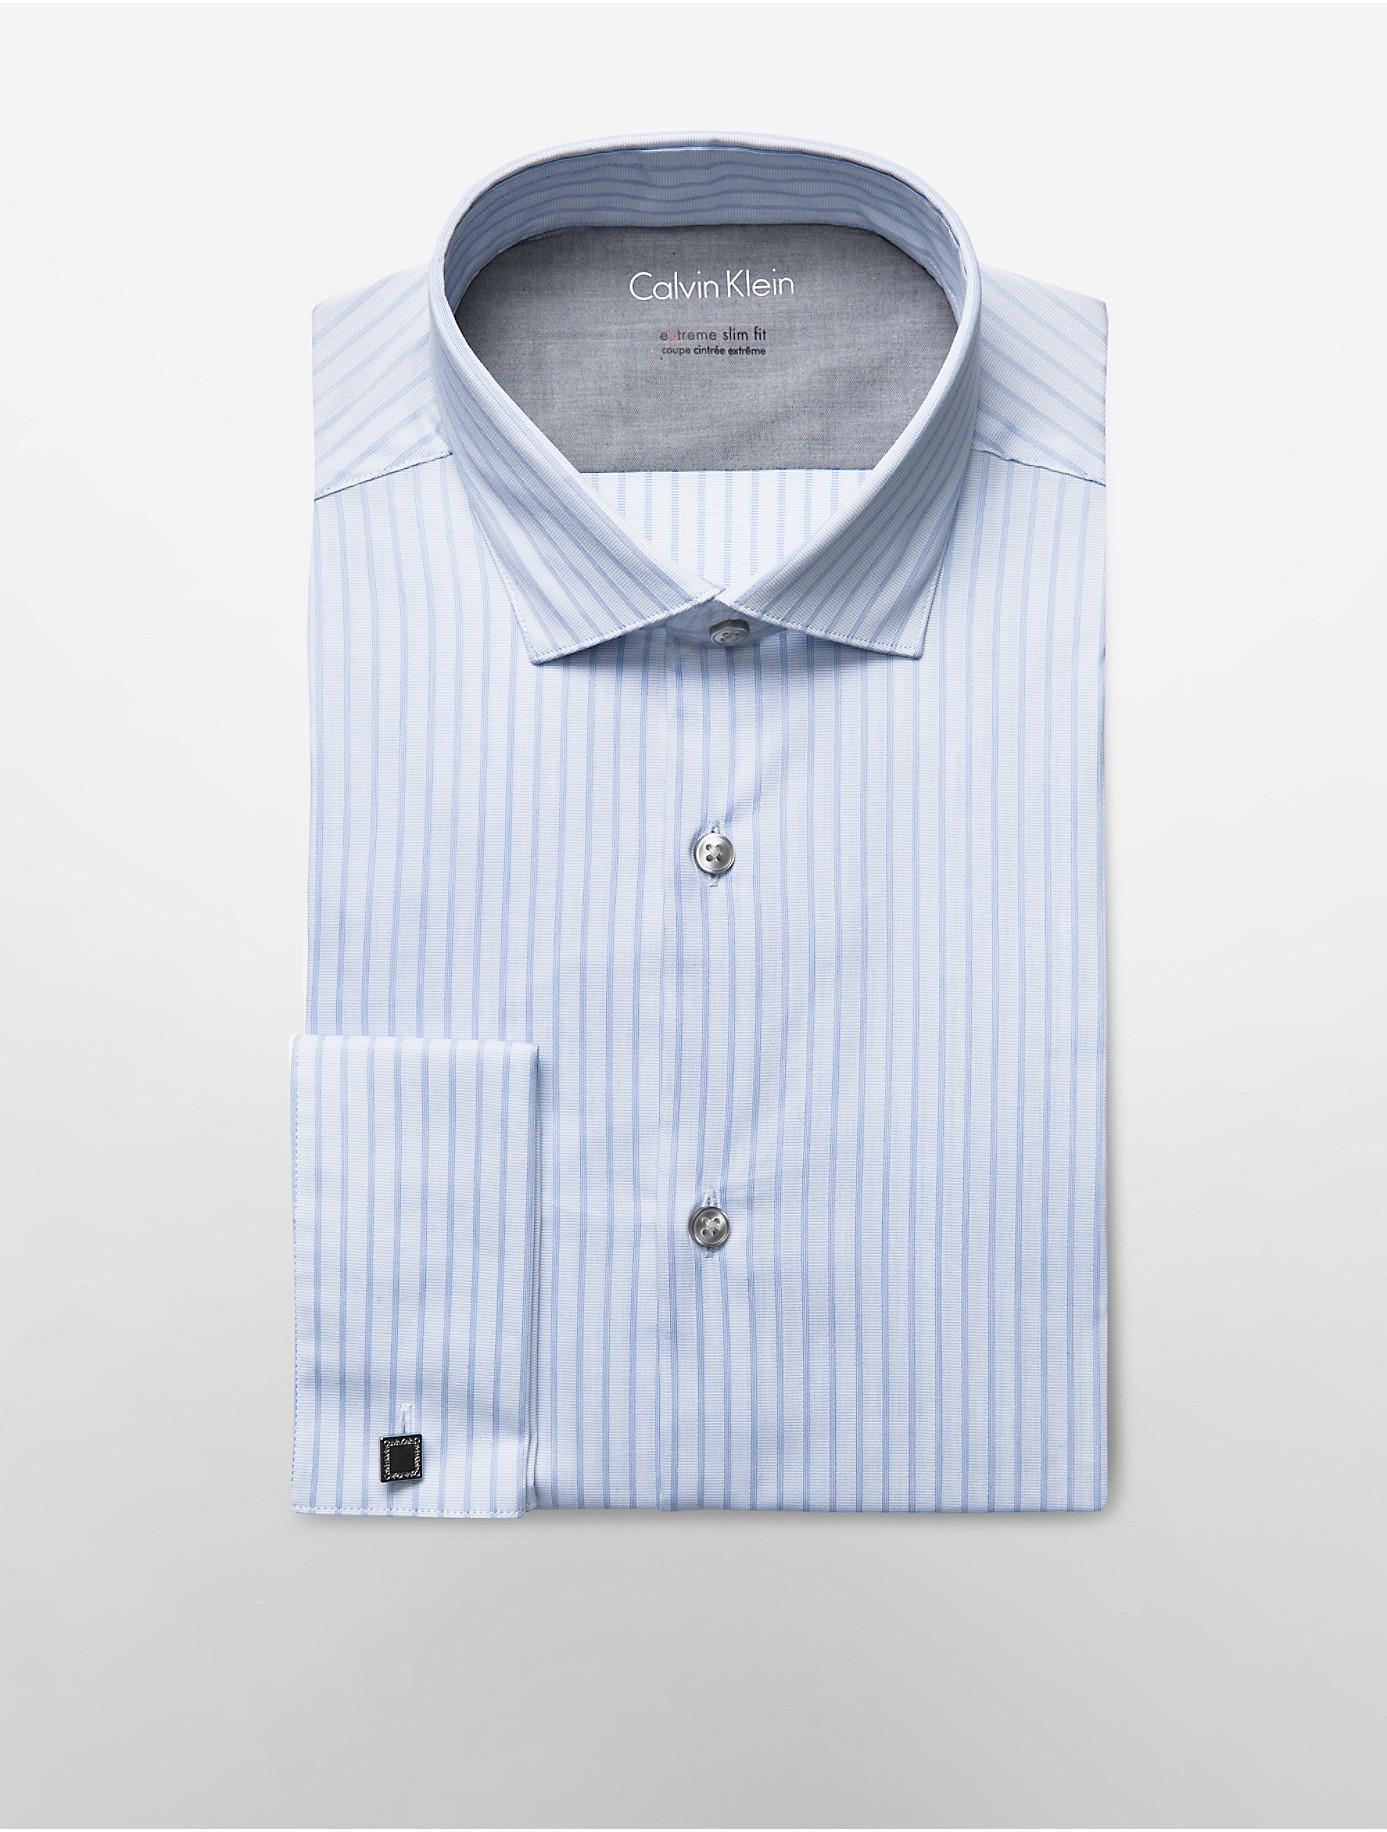 Calvin klein white label x fit ultra slim fit blue woven for Calvin klein x fit dress shirt